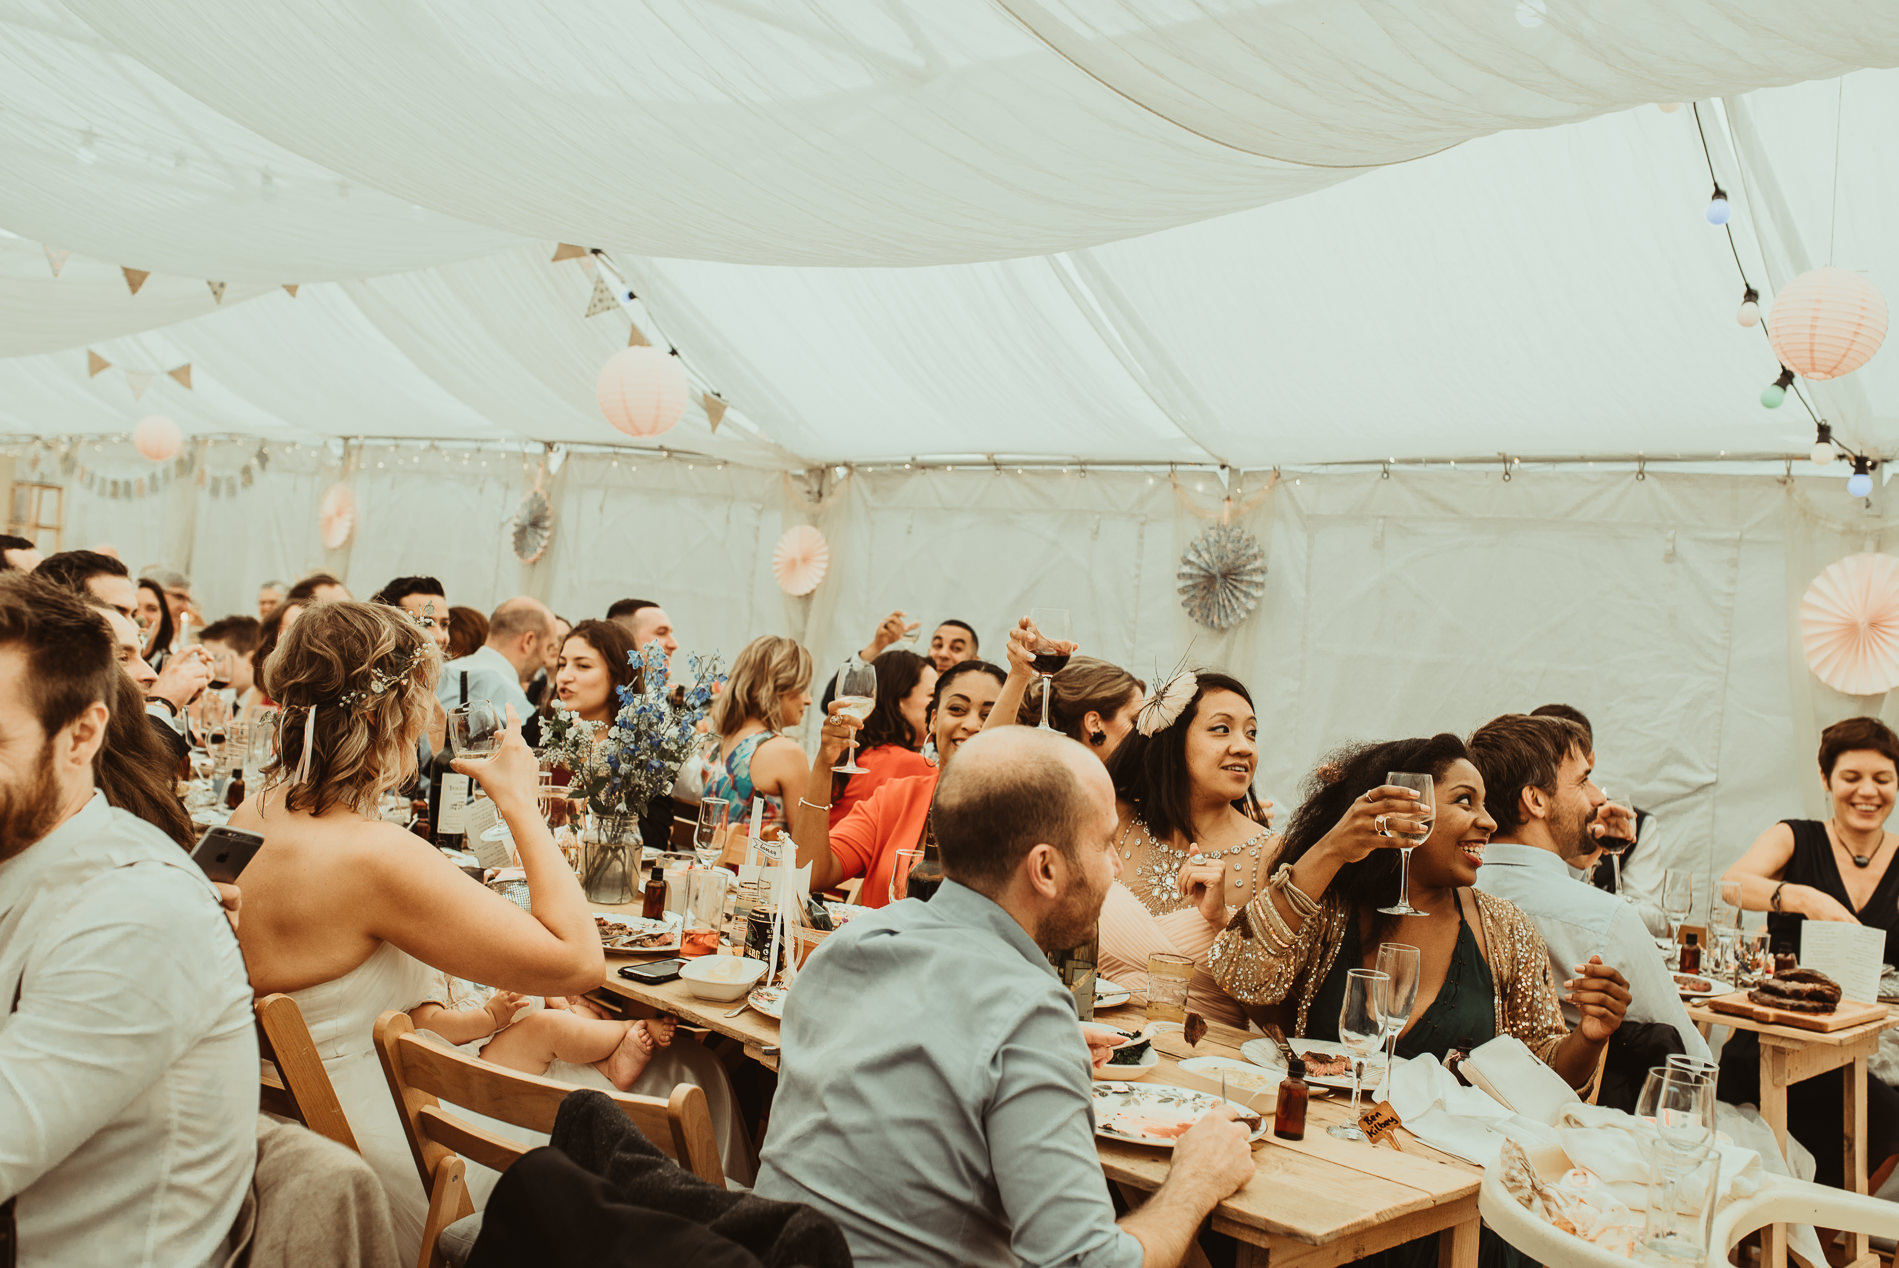 bohemian_wedding_lawshall_church_garden100